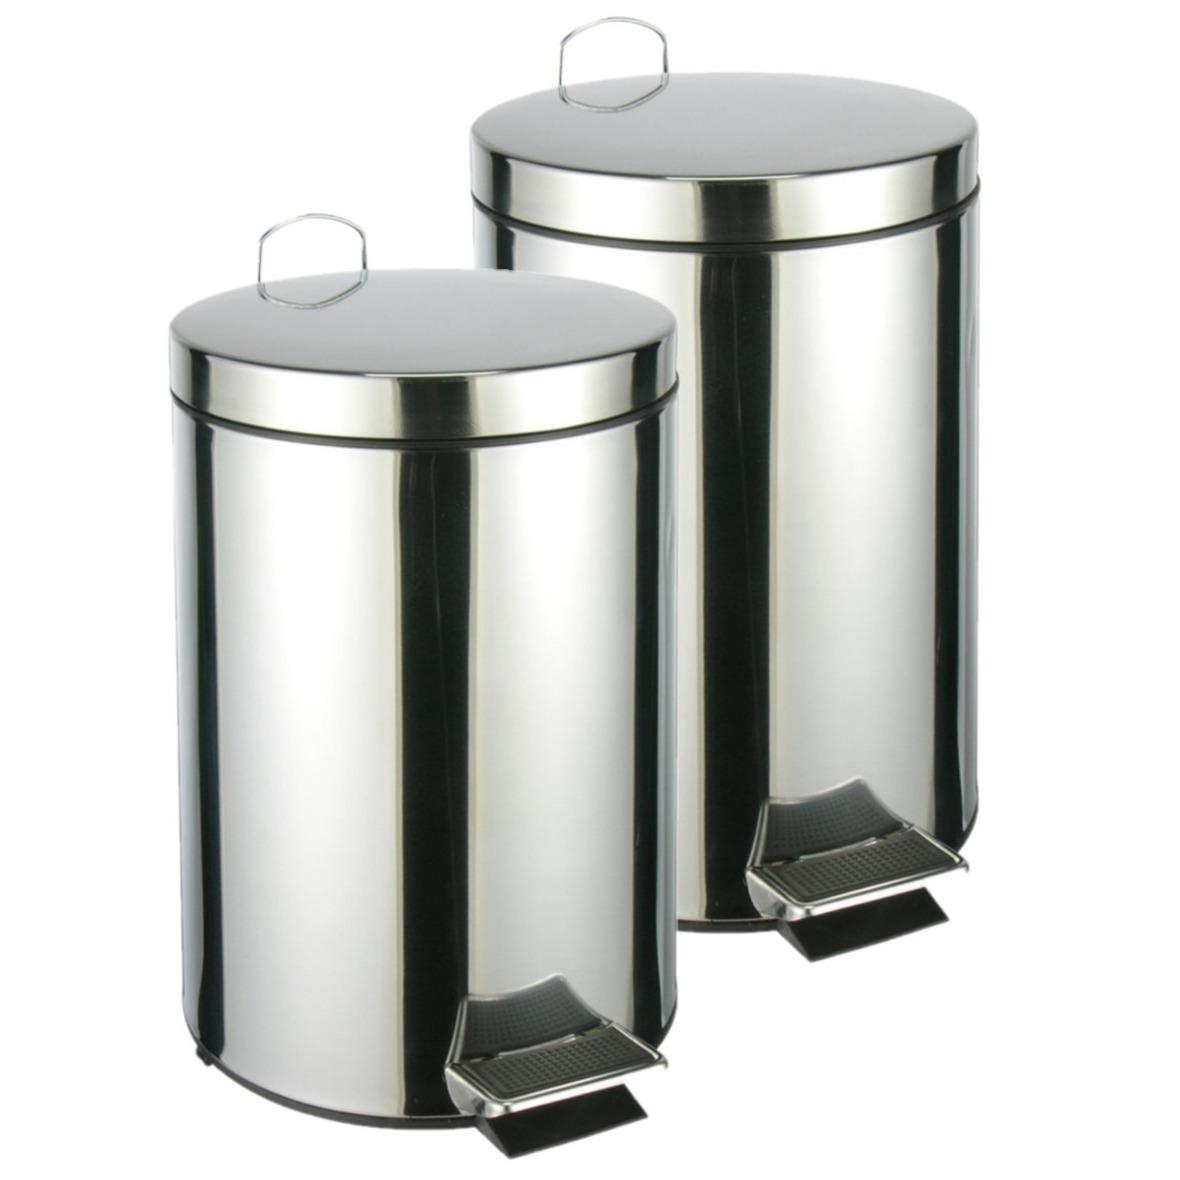 2x stuks RVS pedaalemmers/vuilnisbakken 40 cm 12 liter -